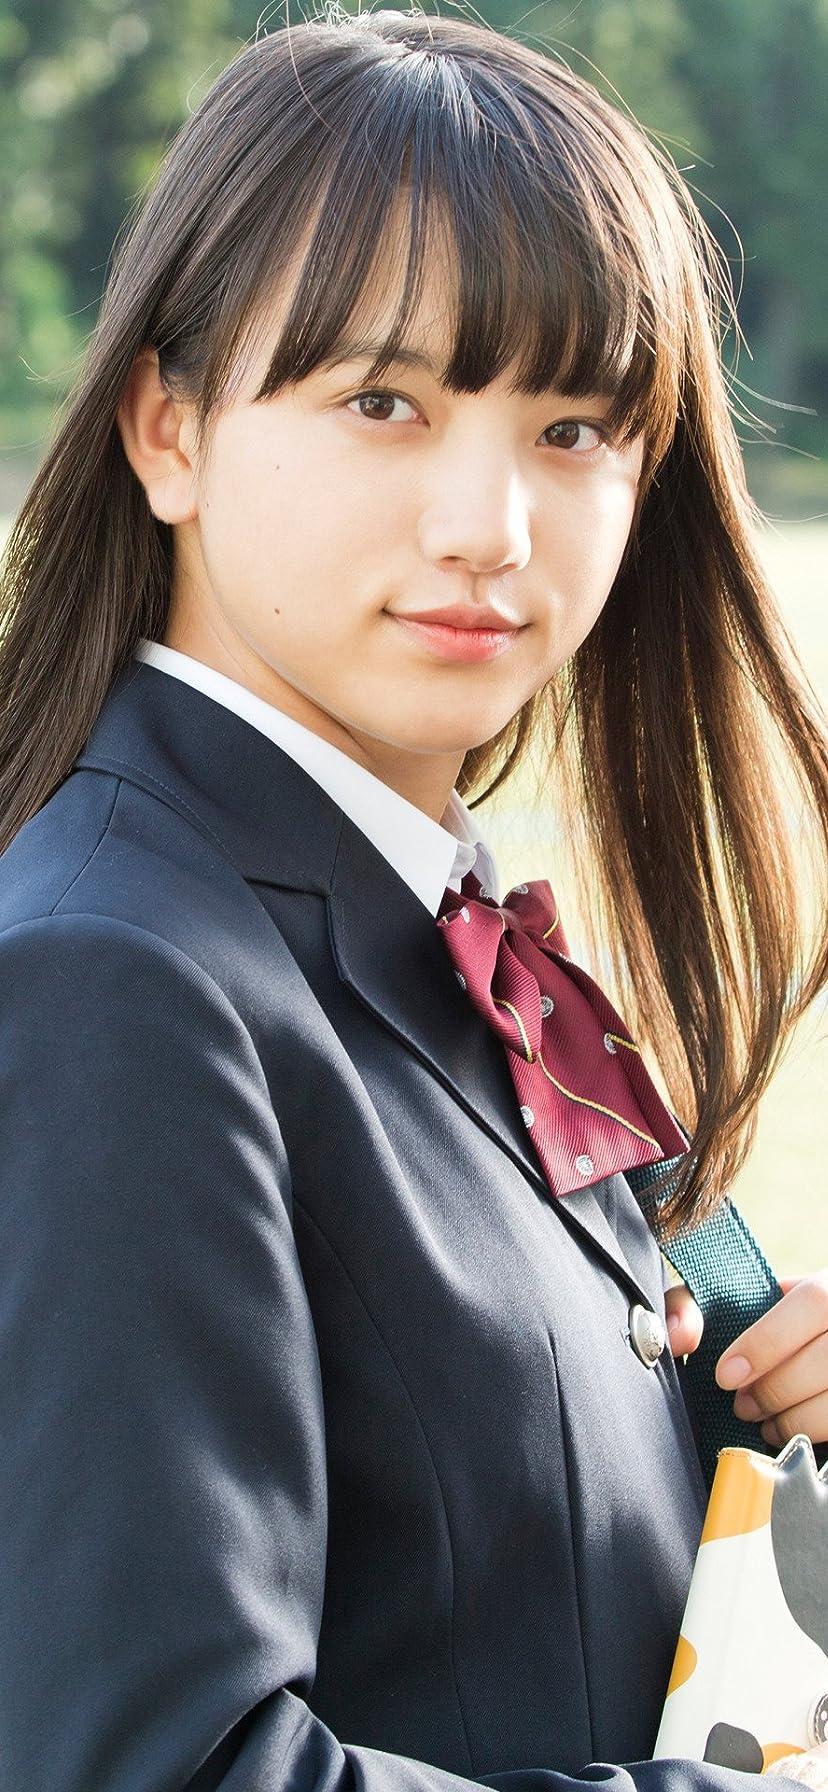 清原果耶 Iphone 11 Pro Max Xr Xs Max 壁紙 女子高生の樫村一期 制服